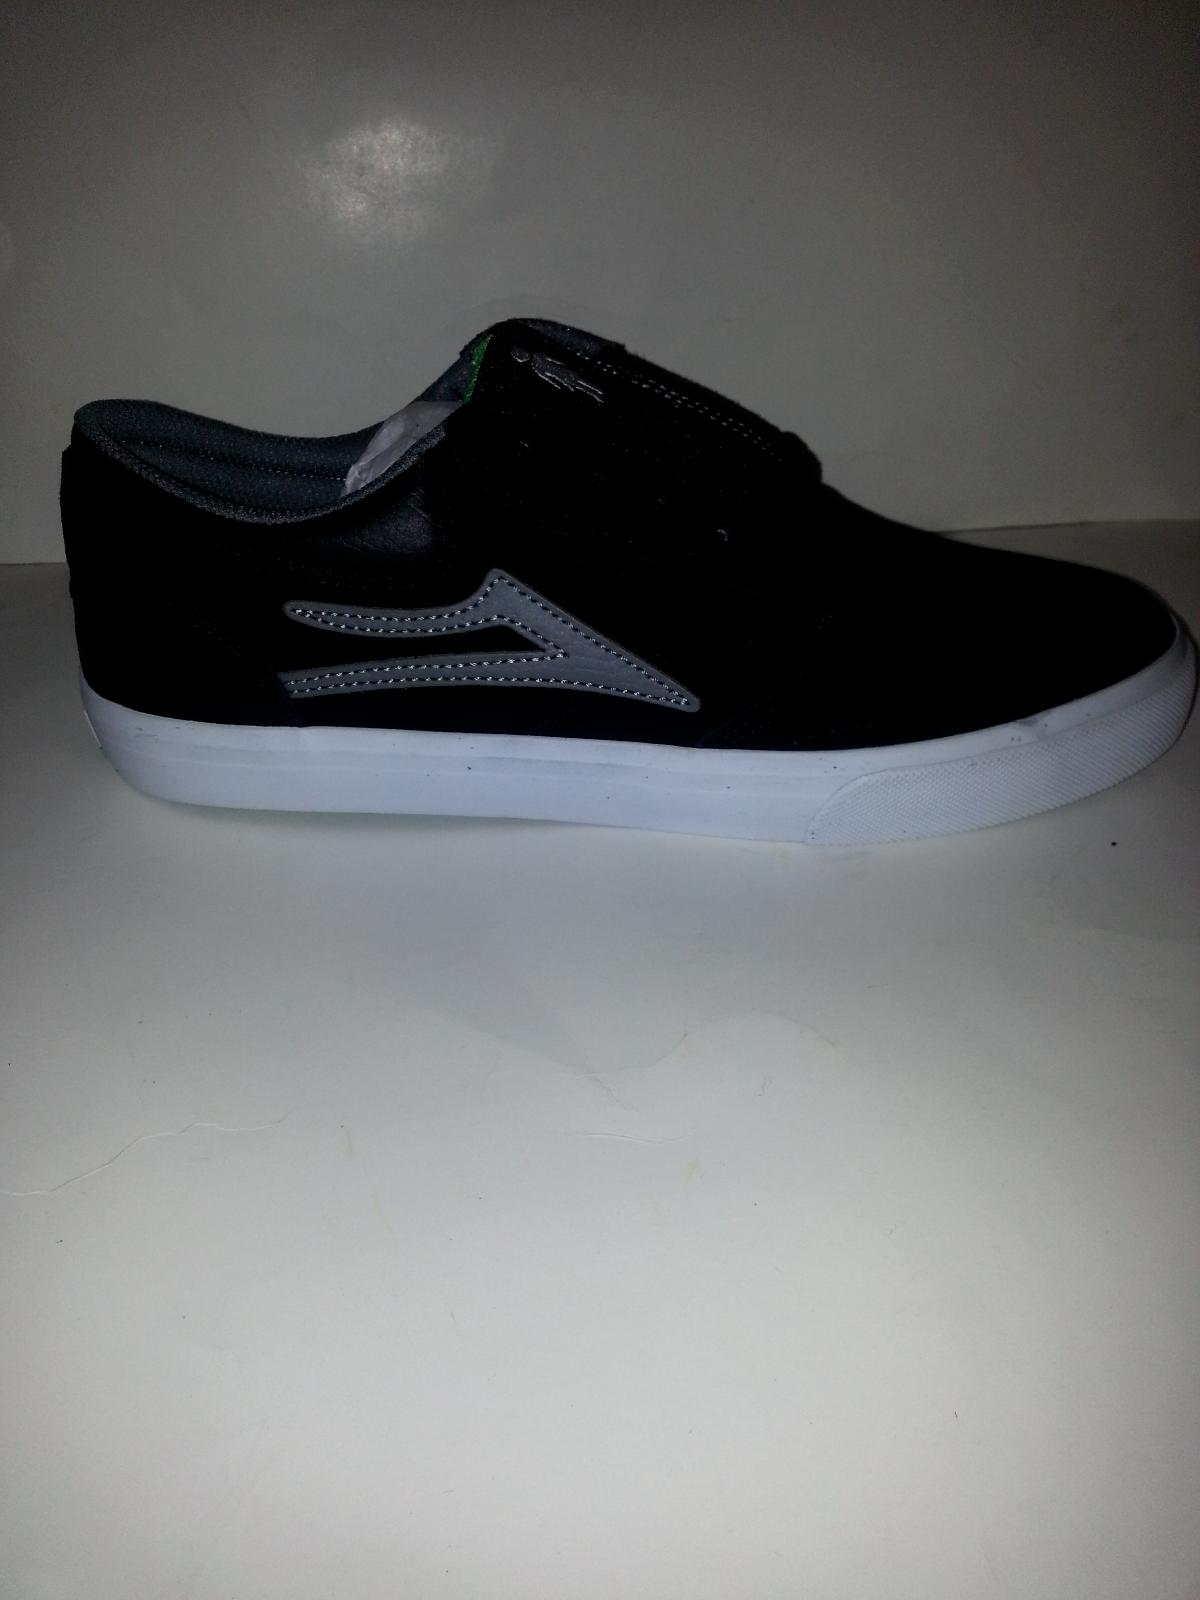 fille skateboard x lakai griffin hommes skateboard fille chaussures; en daim noir / gris / ms317-0227-a00; 4045d3